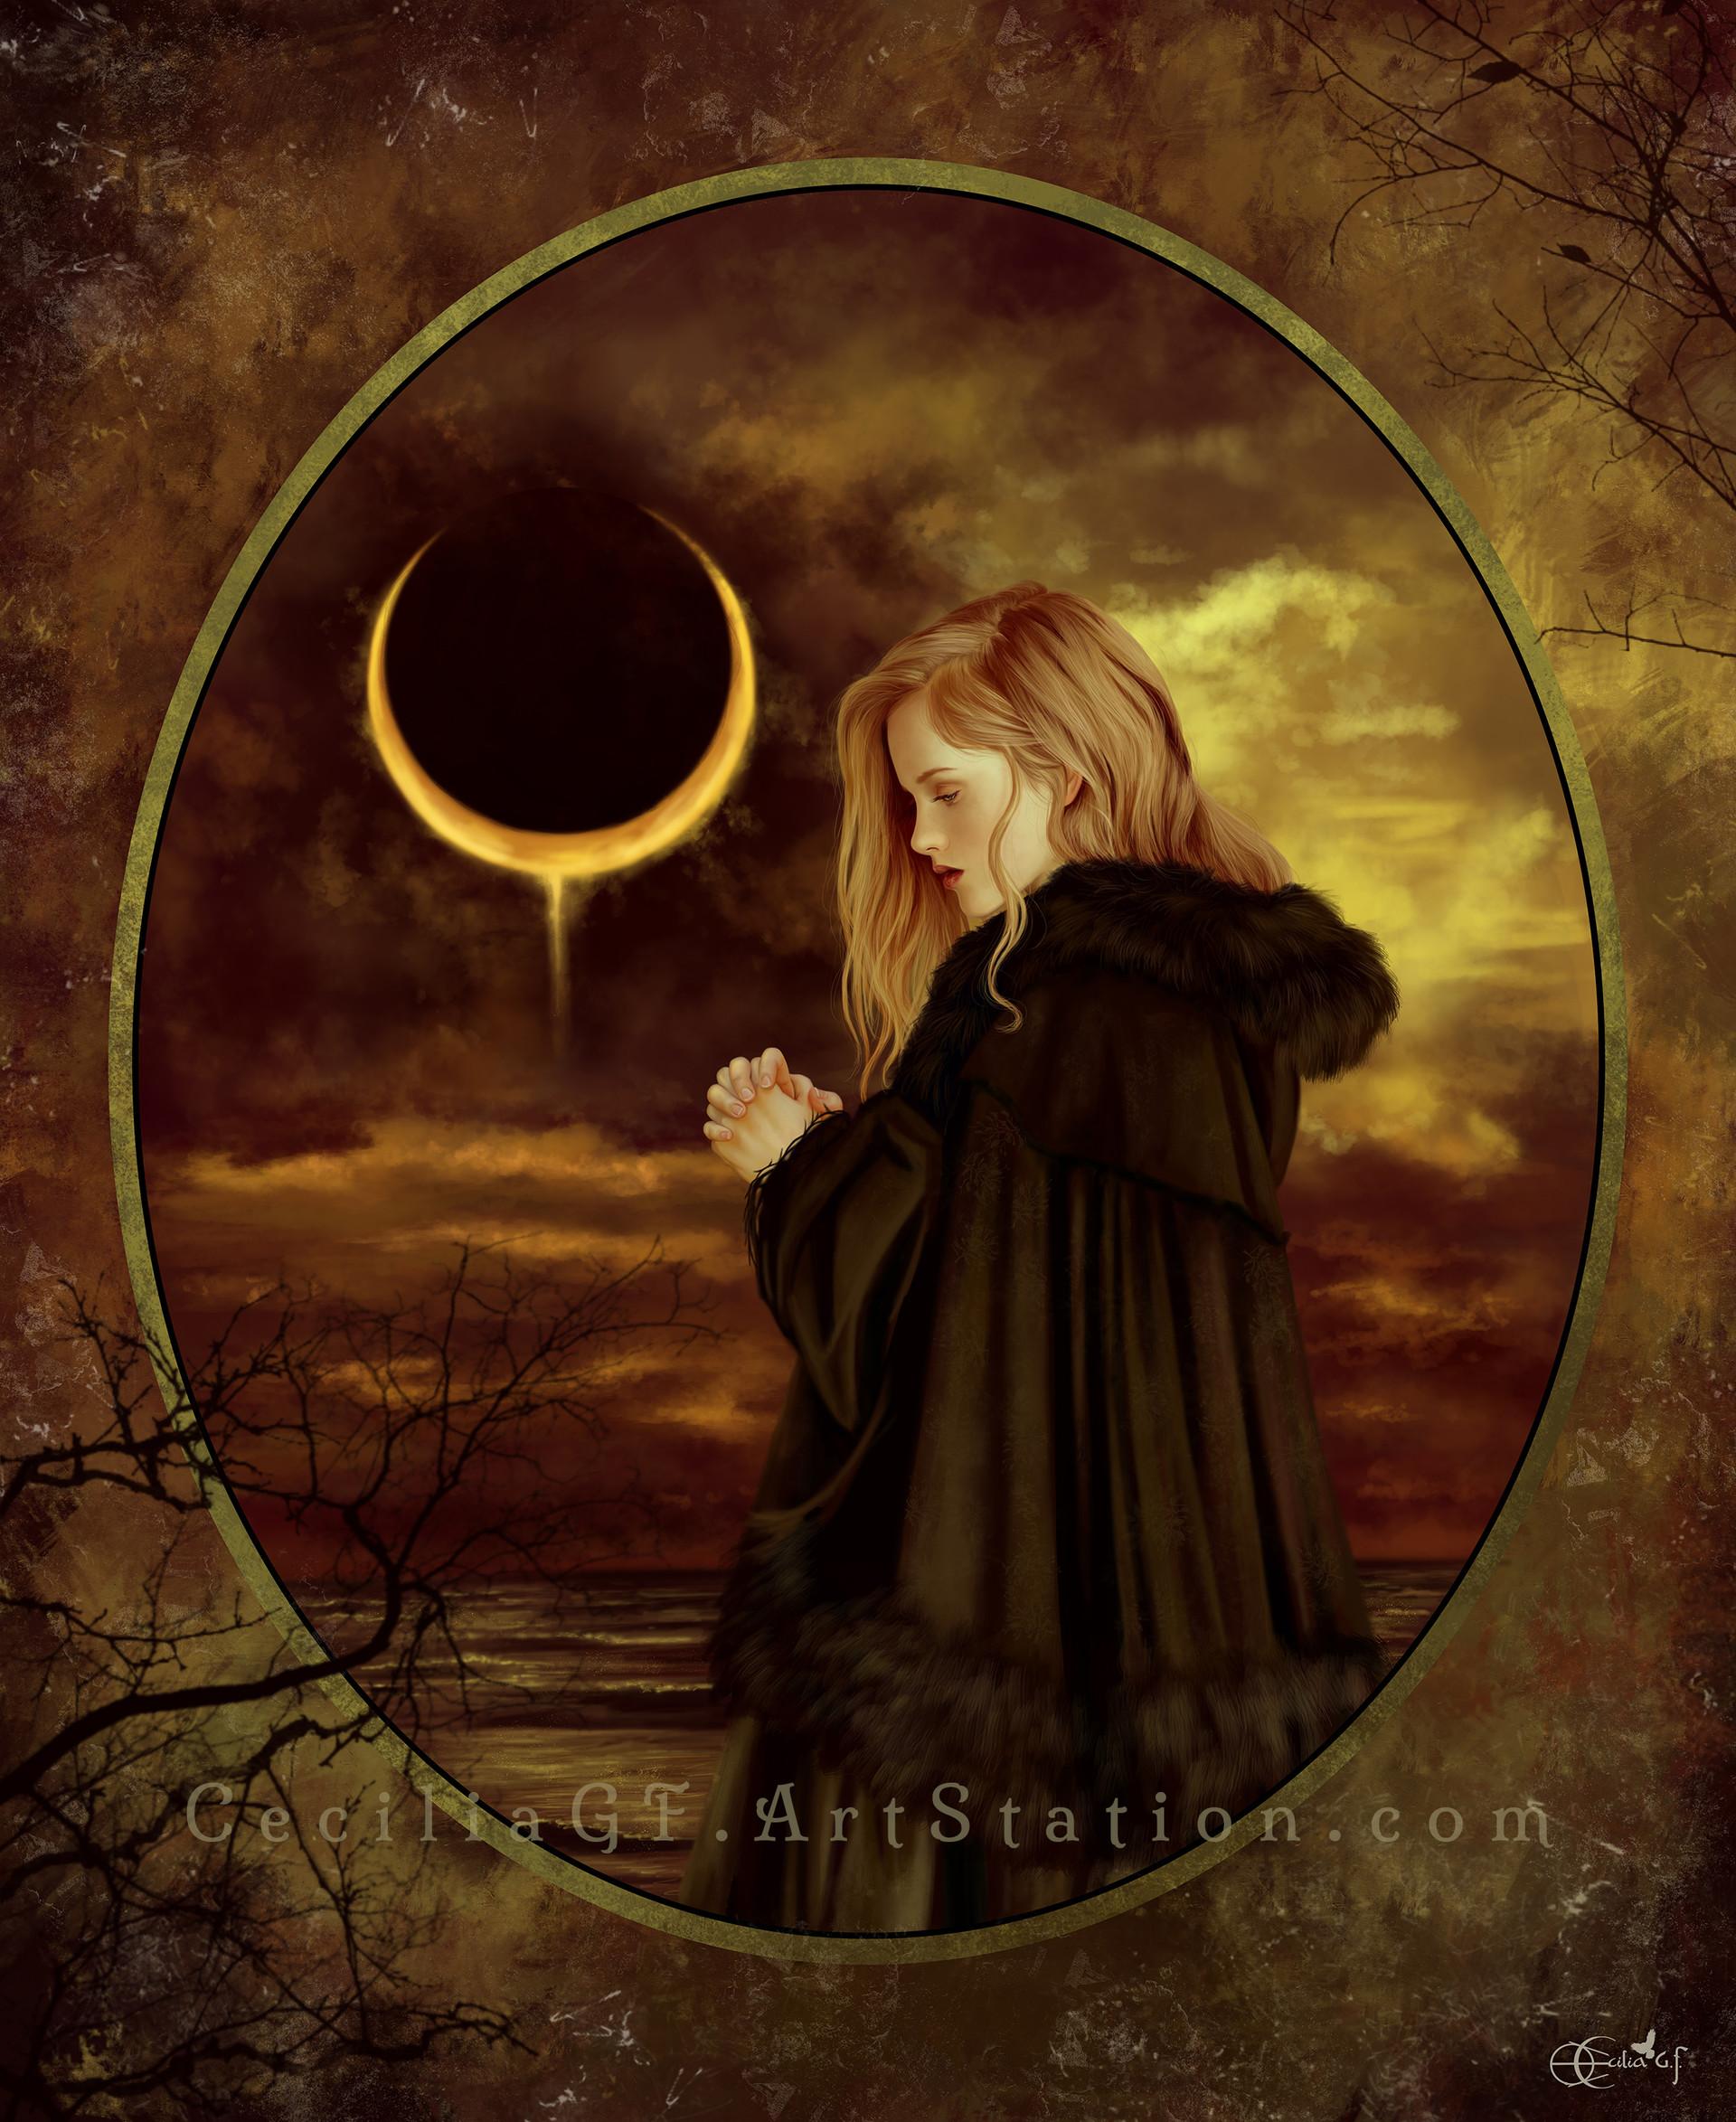 Cecilia g f innocent moon